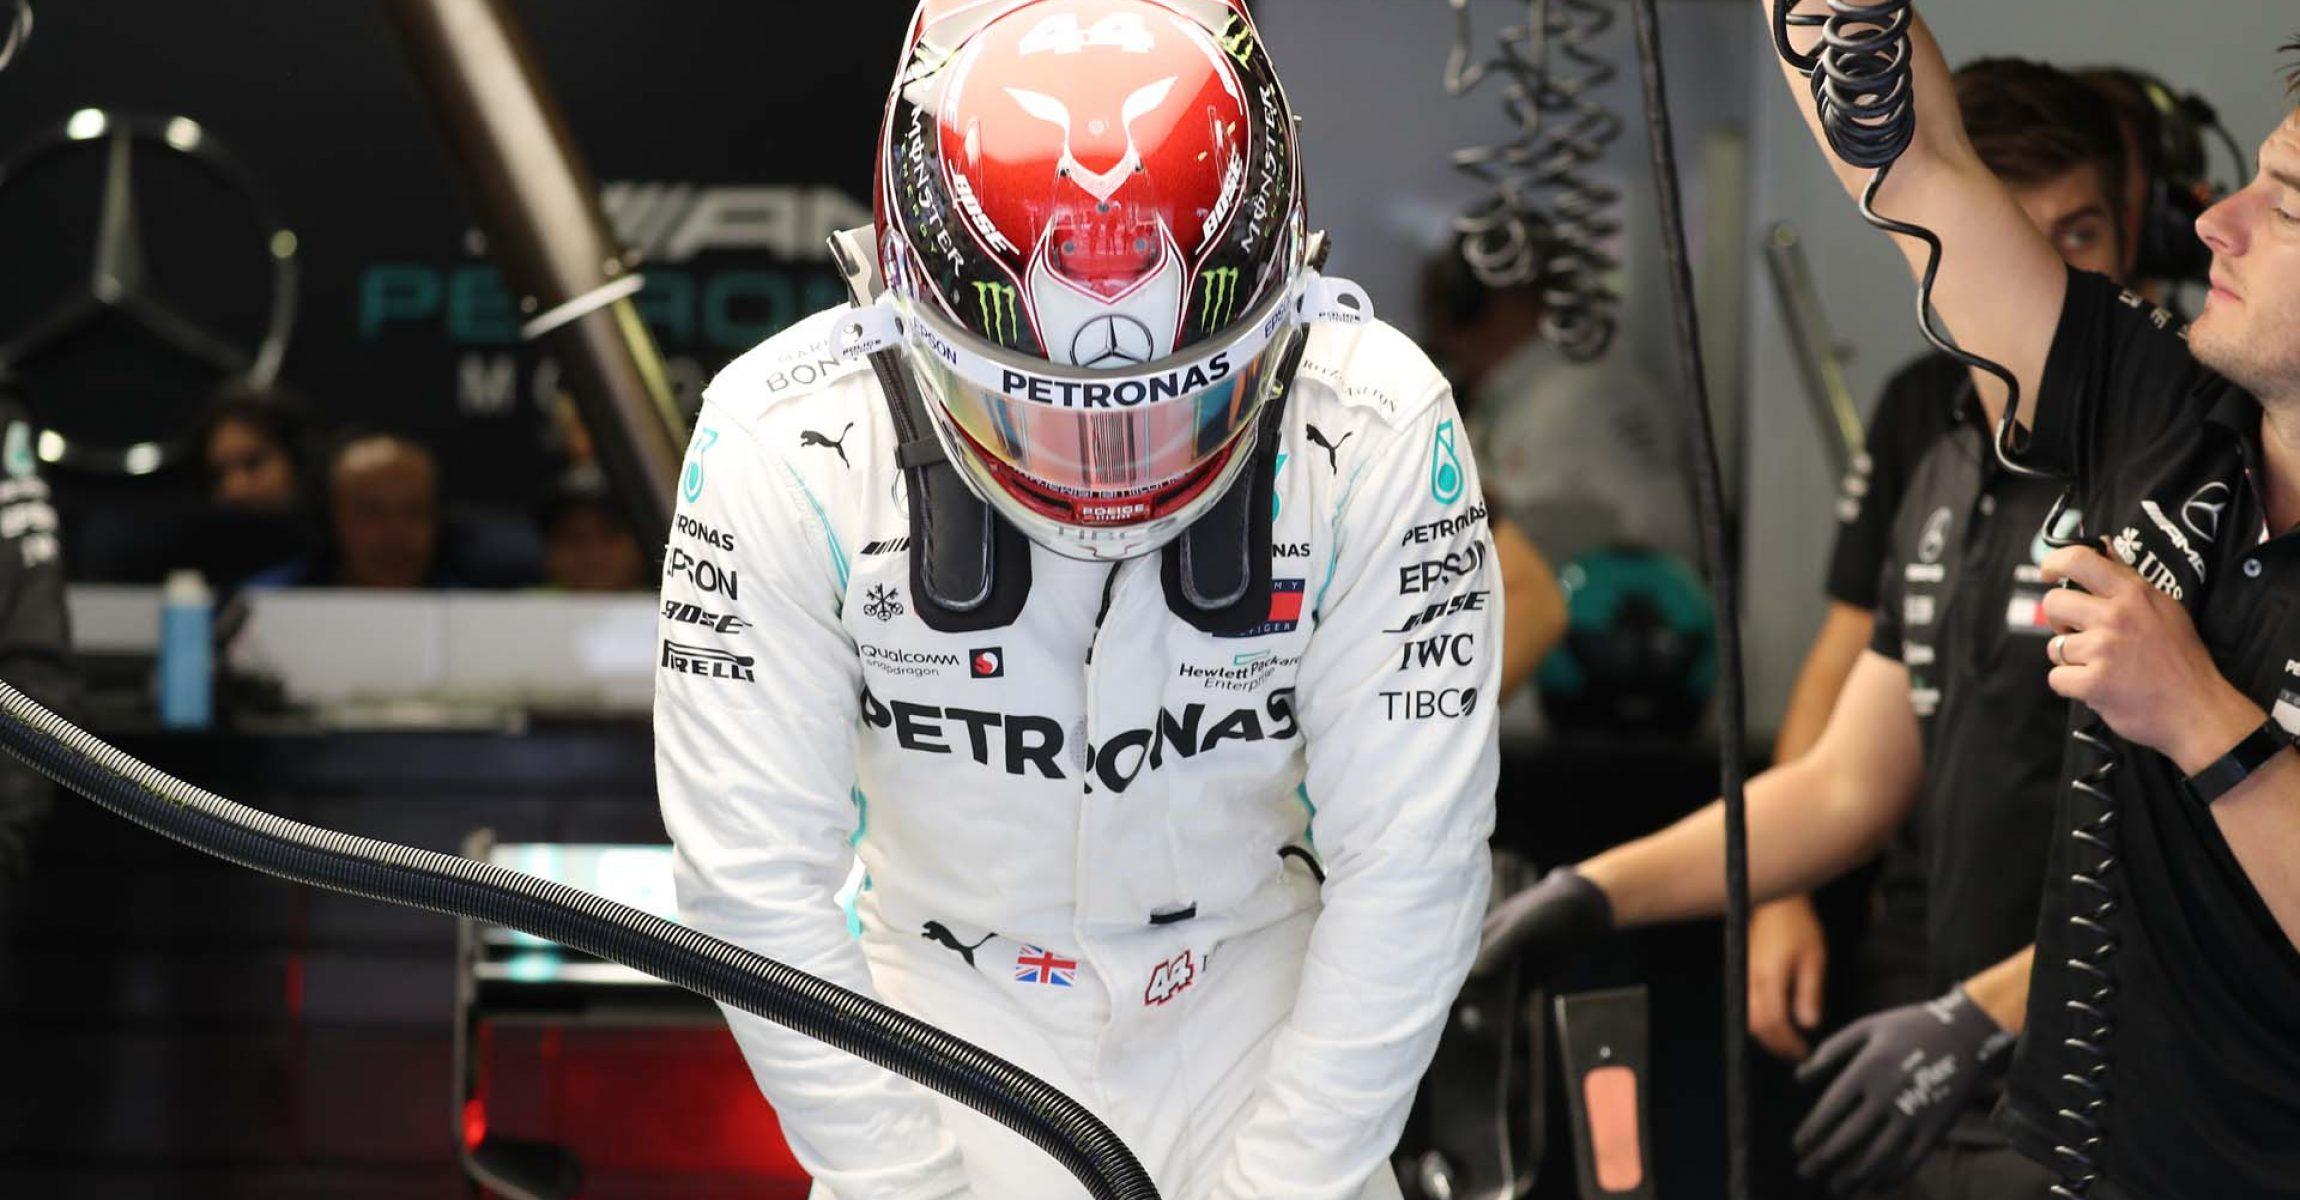 Italian Grand Prix 2019, Monza, Friday, Lewis Hamilton, Mercedes